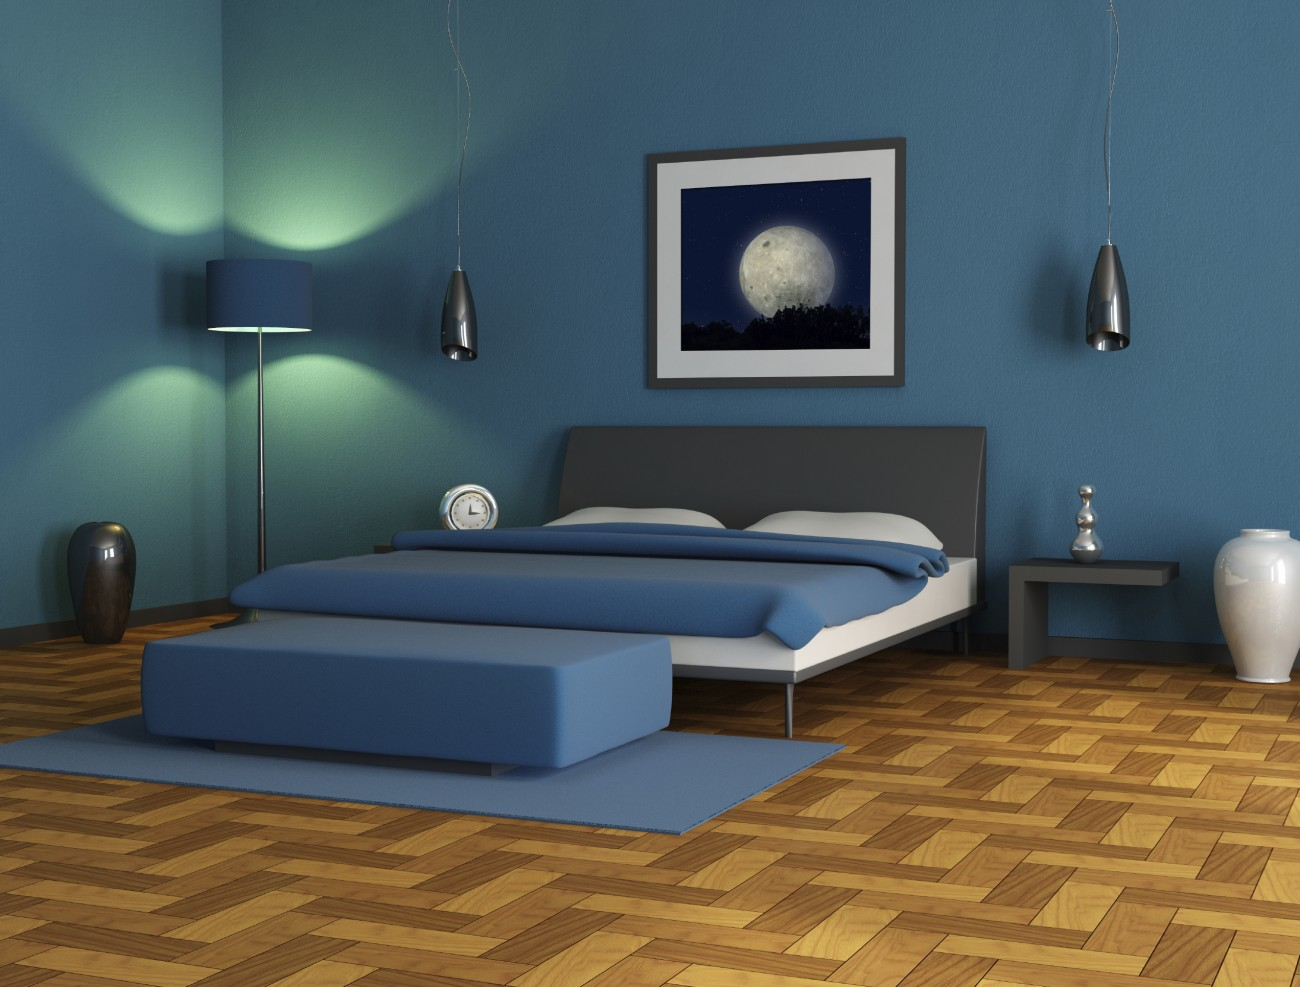 Farben Furs Schlafzimmer – Caseconrad.com